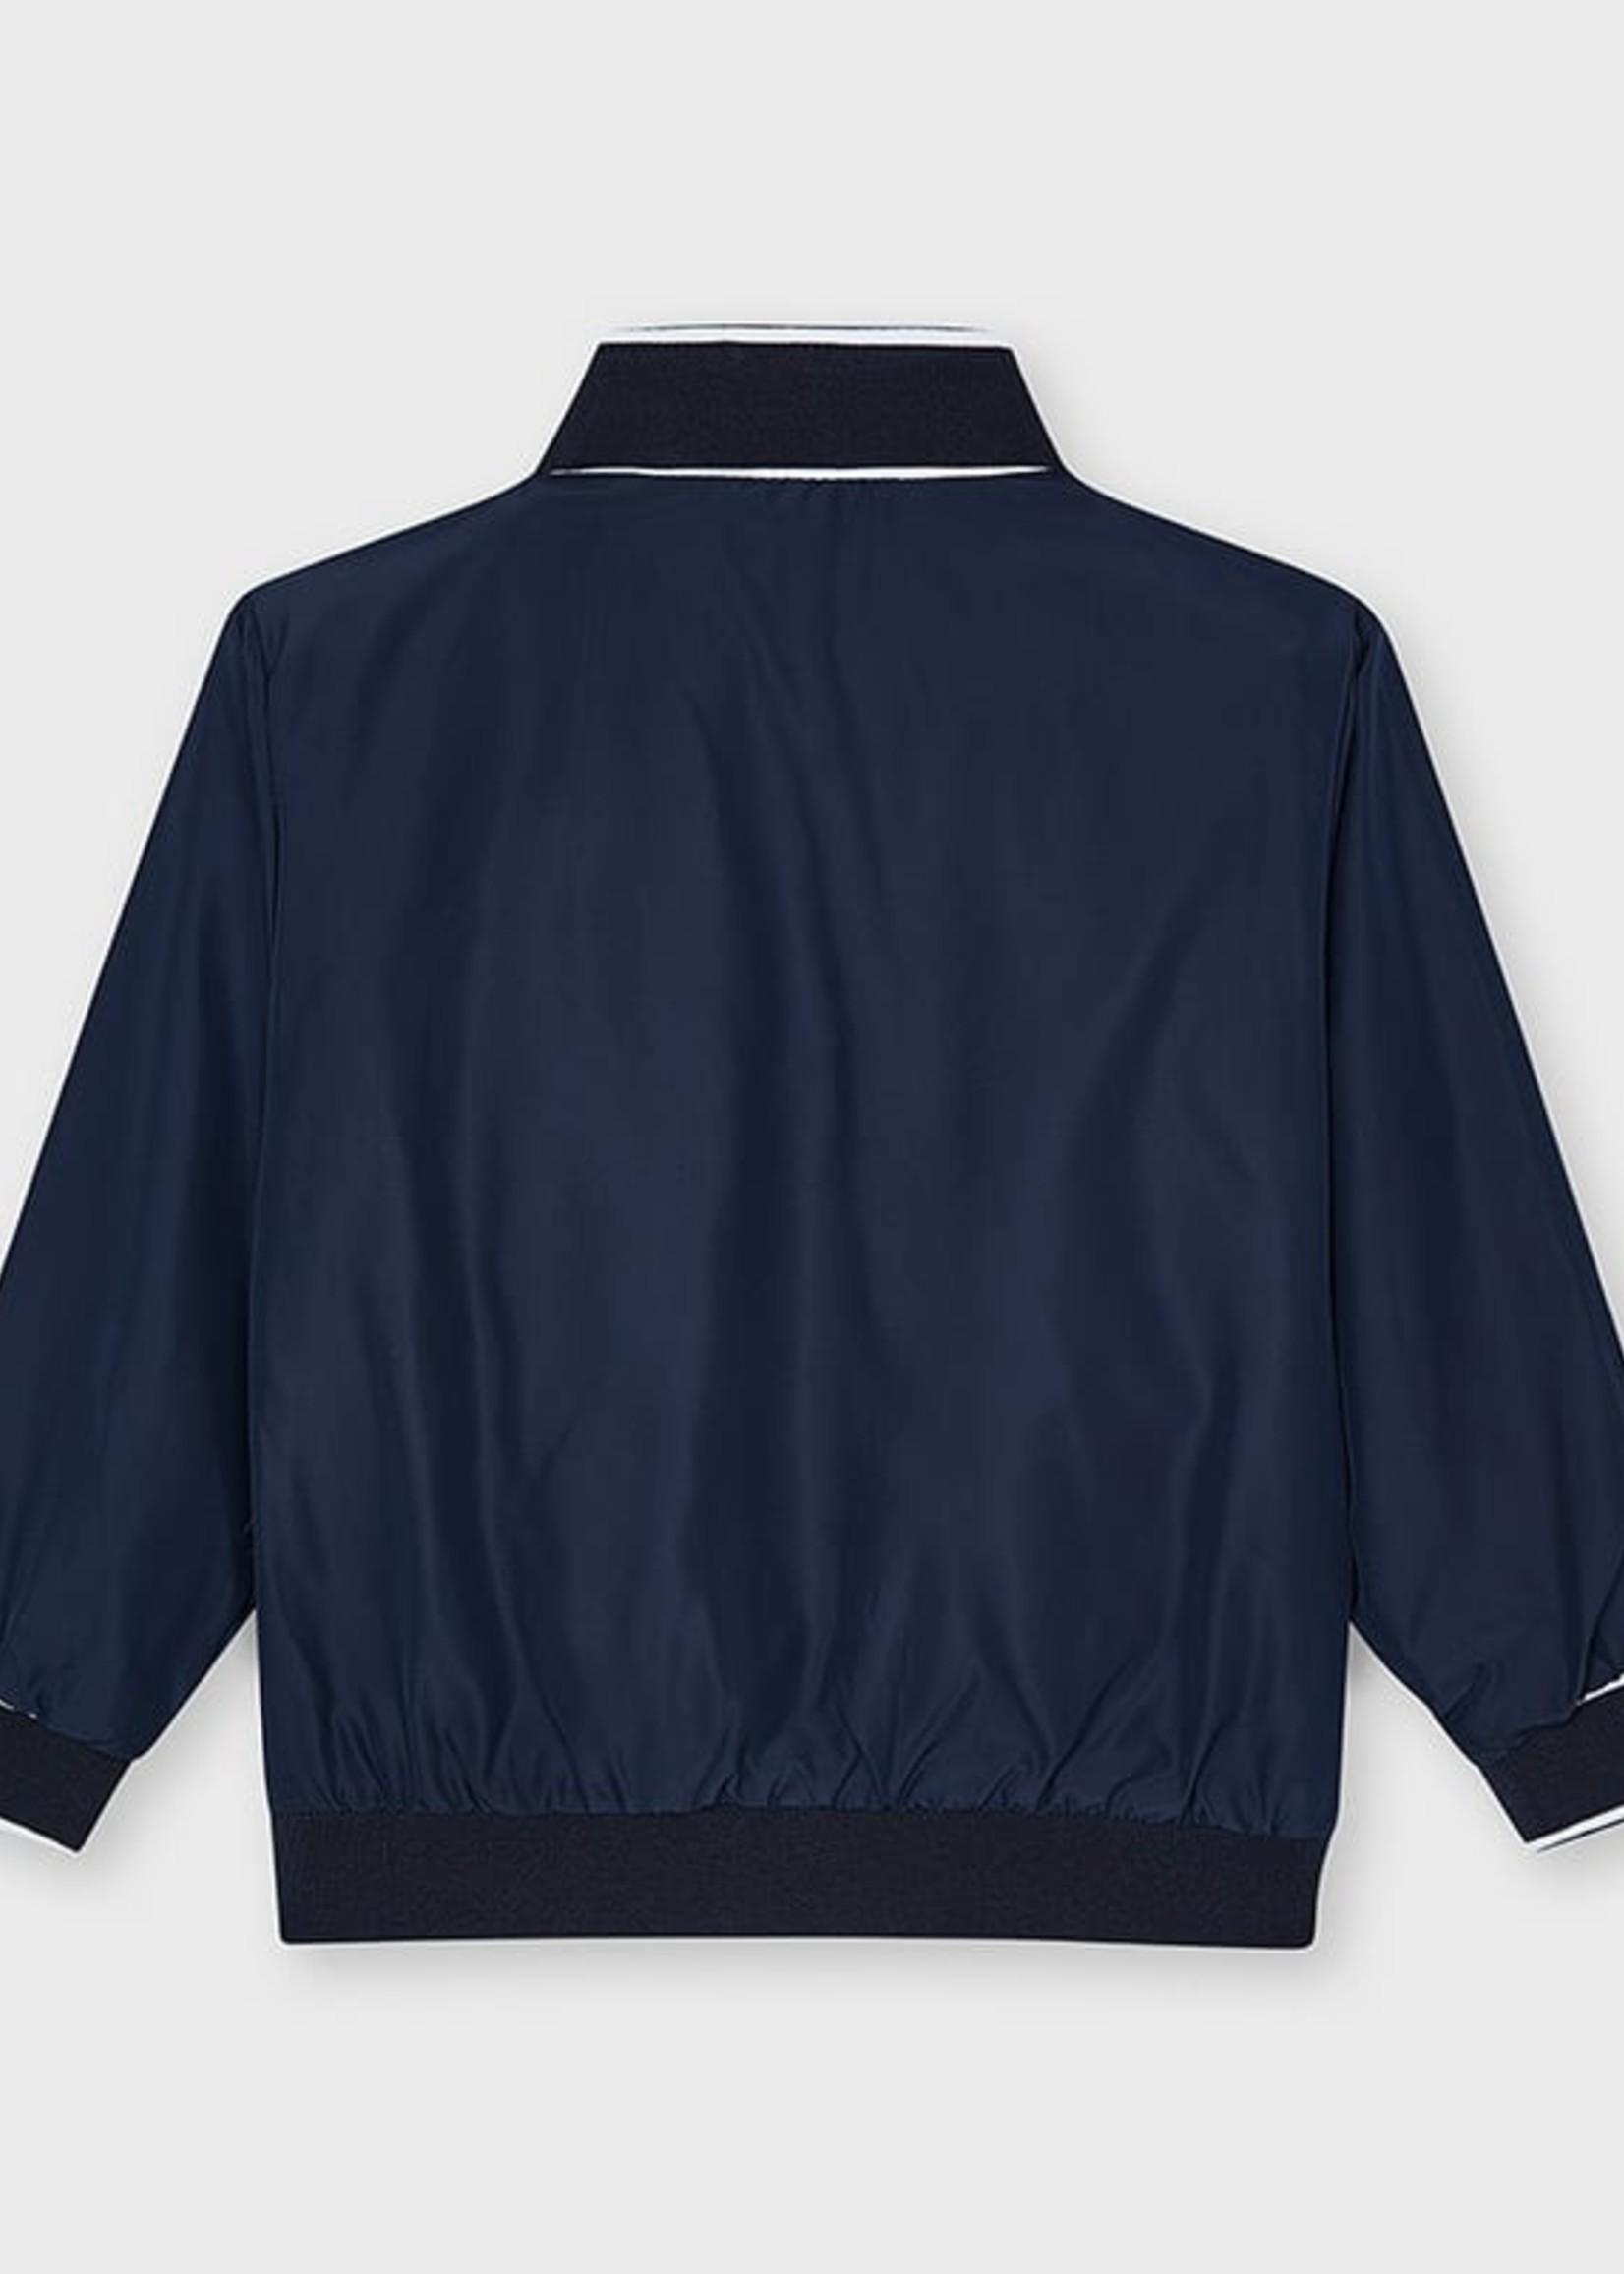 Mayoral Mayoral reversible windbreaker jacket for boy